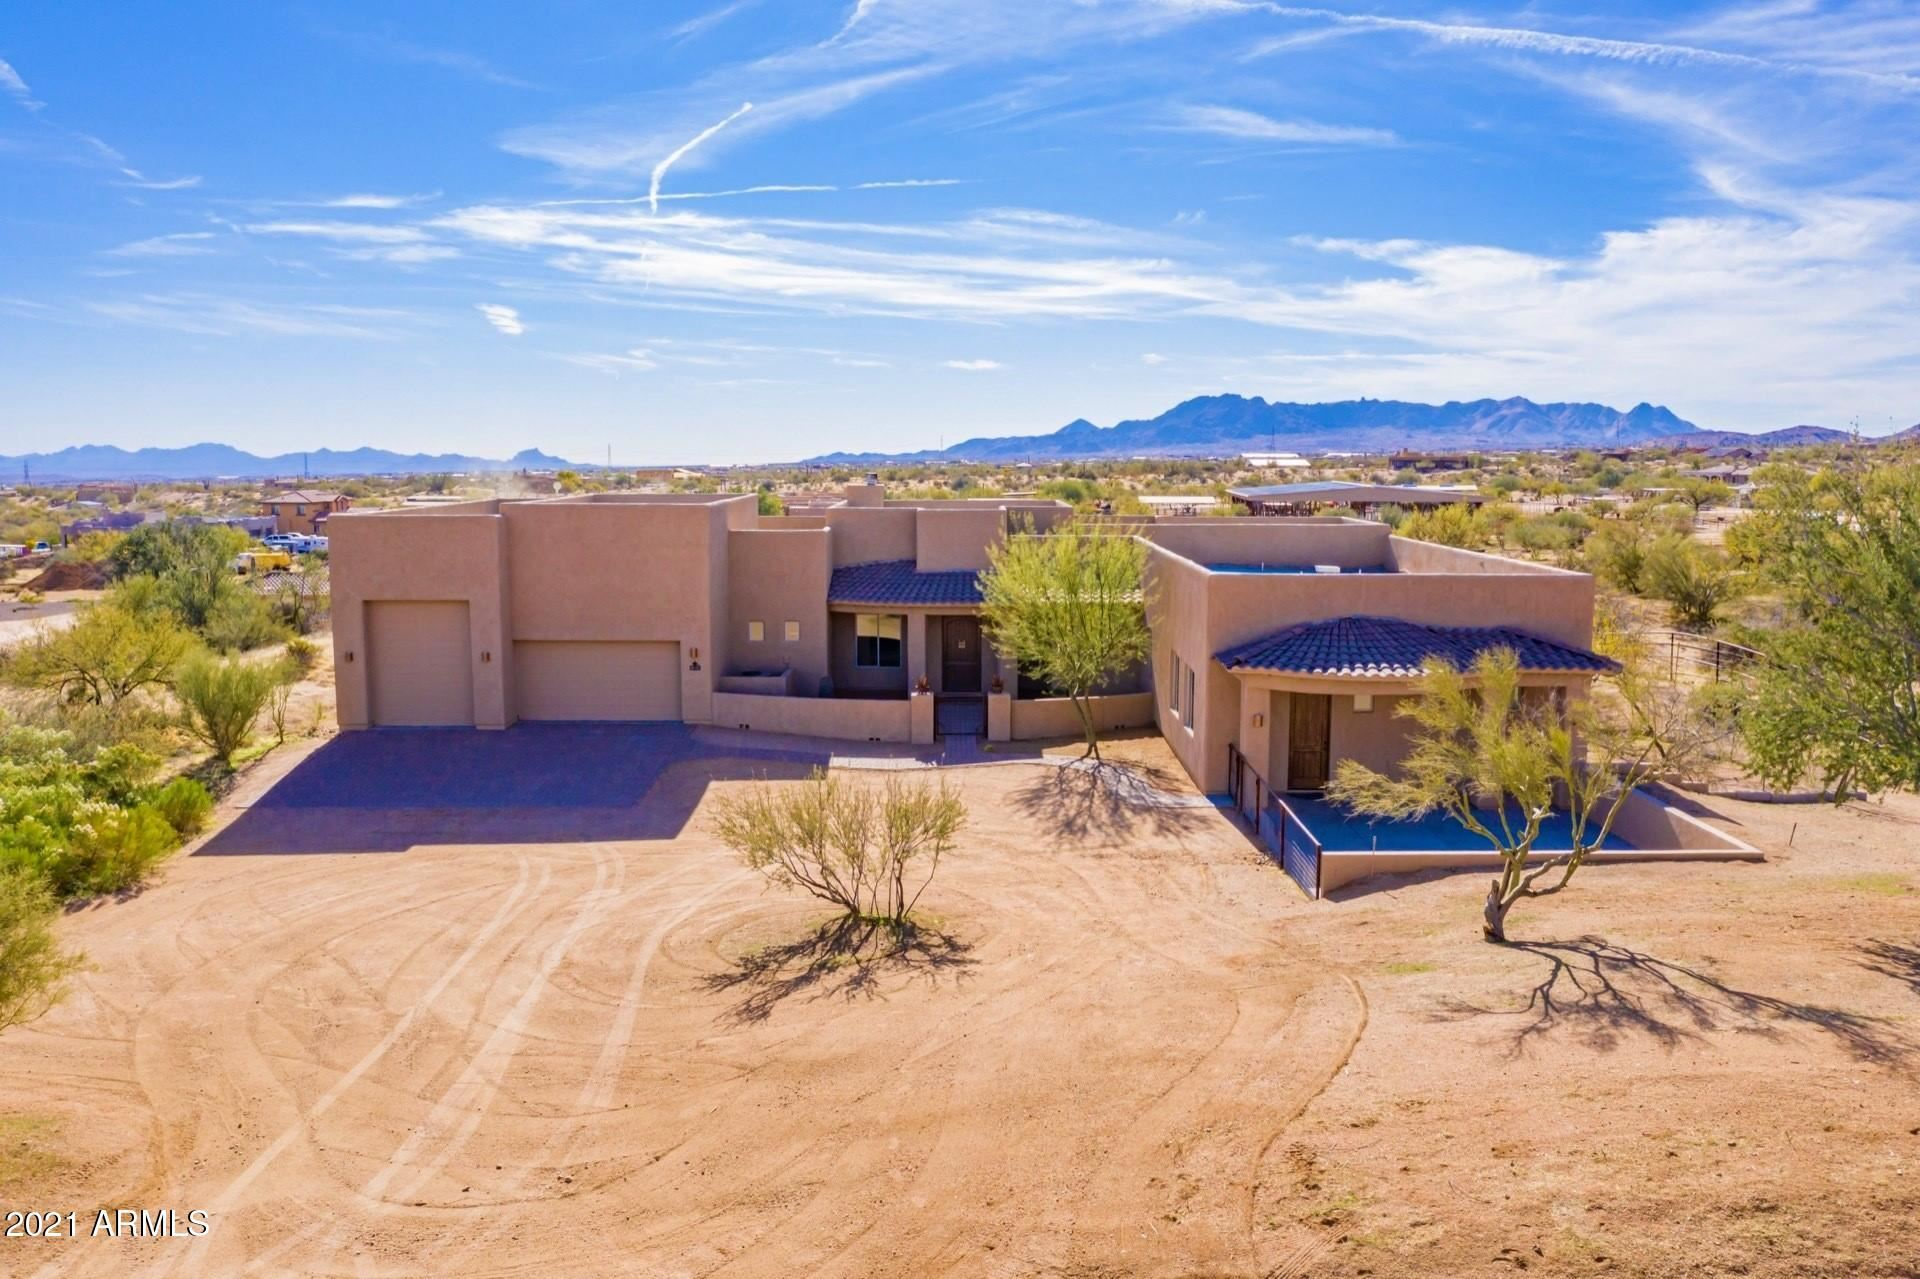 Photo for 13935 E SMOKEHOUSE Trail, Scottsdale, AZ 85262 (MLS # 6179778)